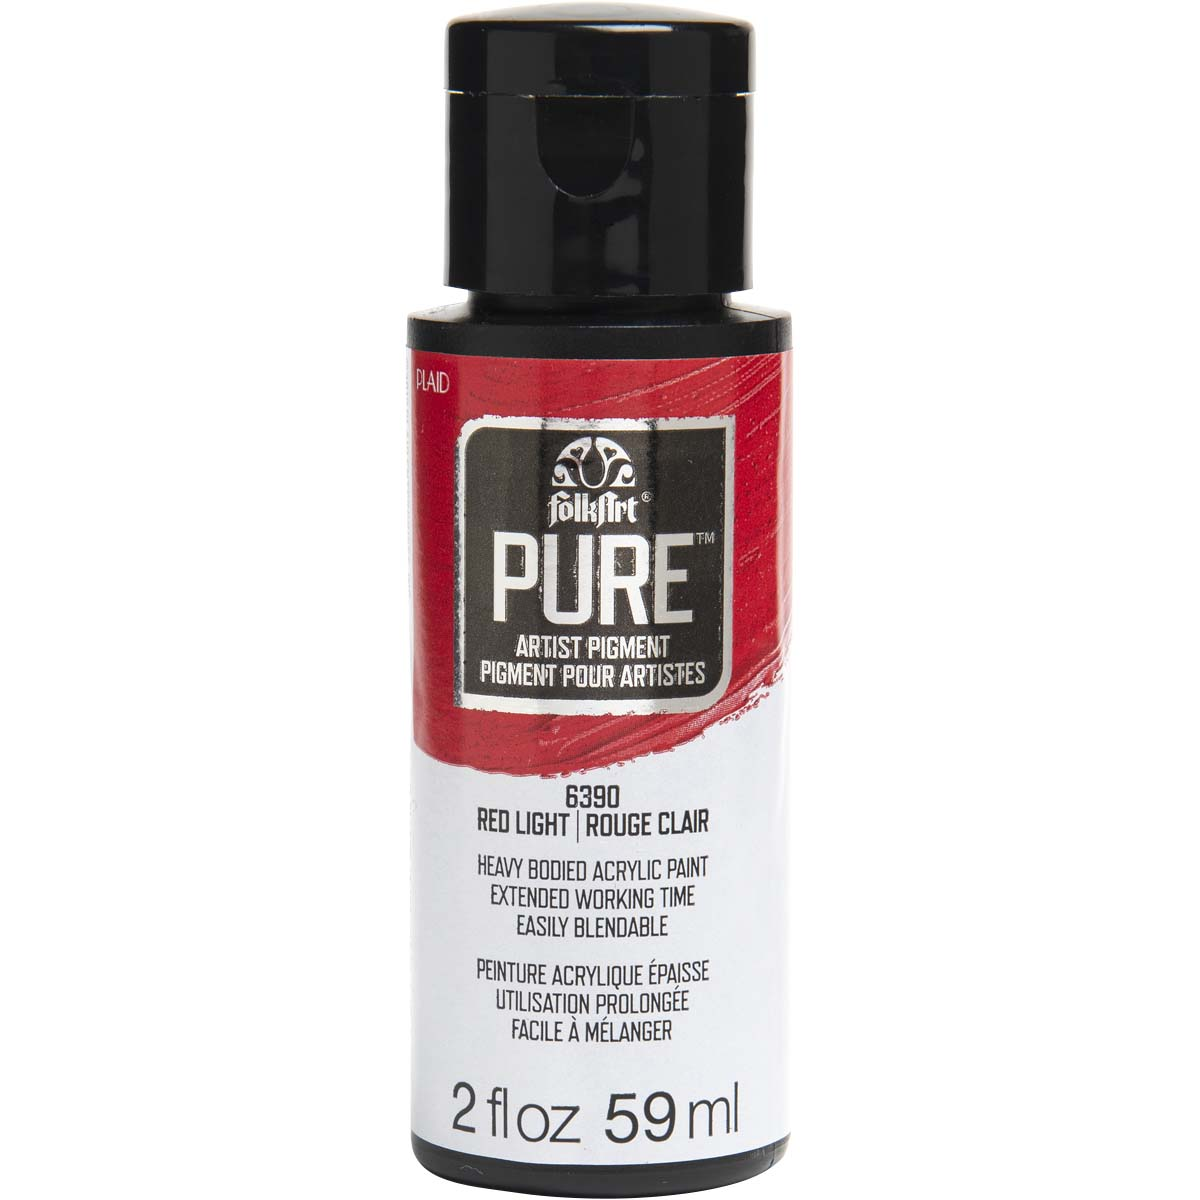 FolkArt ® Pure™ Artist Pigment - Red Light, 2 oz. - 6390